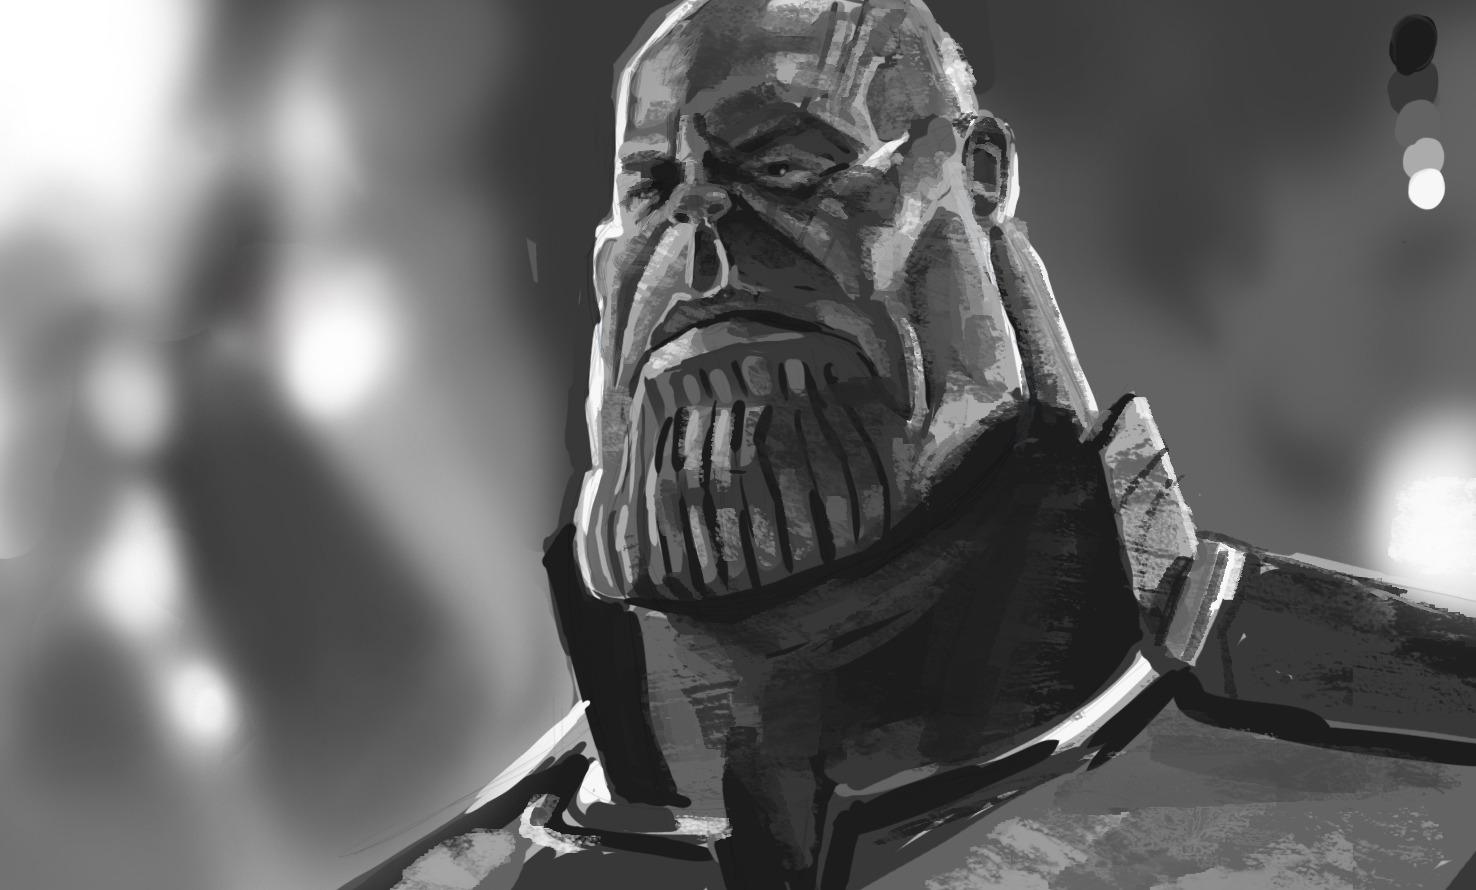 Thanos caricature study